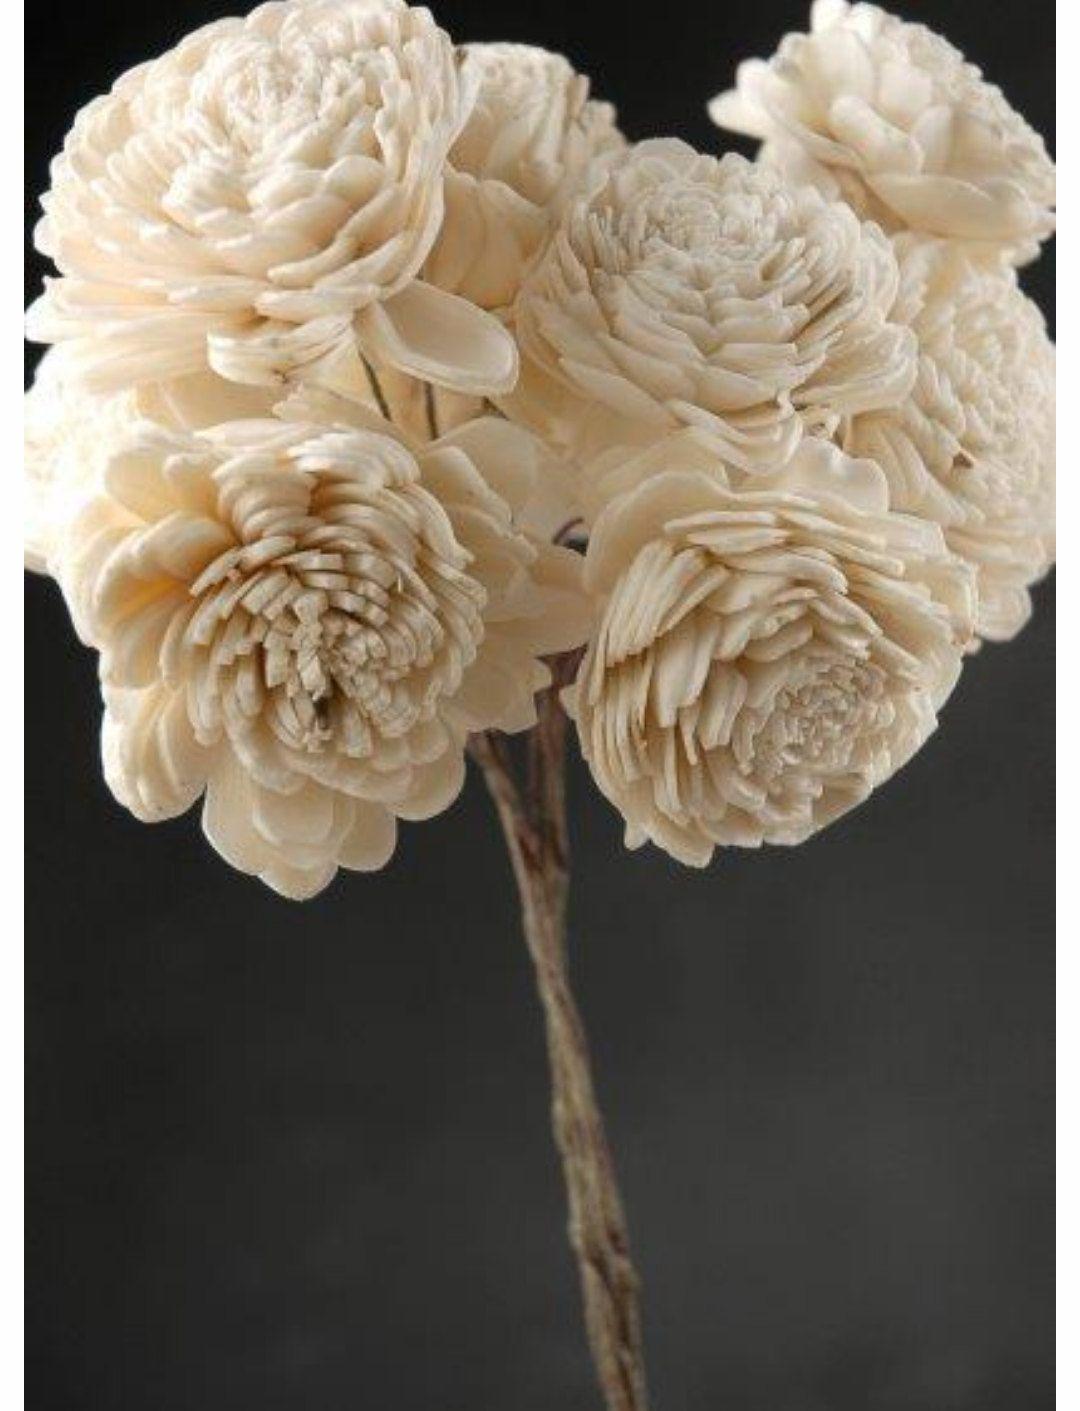 Wholesale tapioca wood sola flowers eco friendly bridal wedding wholesale tapioca wood sola flowers eco friendly bridal wedding flowers on stems 10 stems by baubleandflair izmirmasajfo